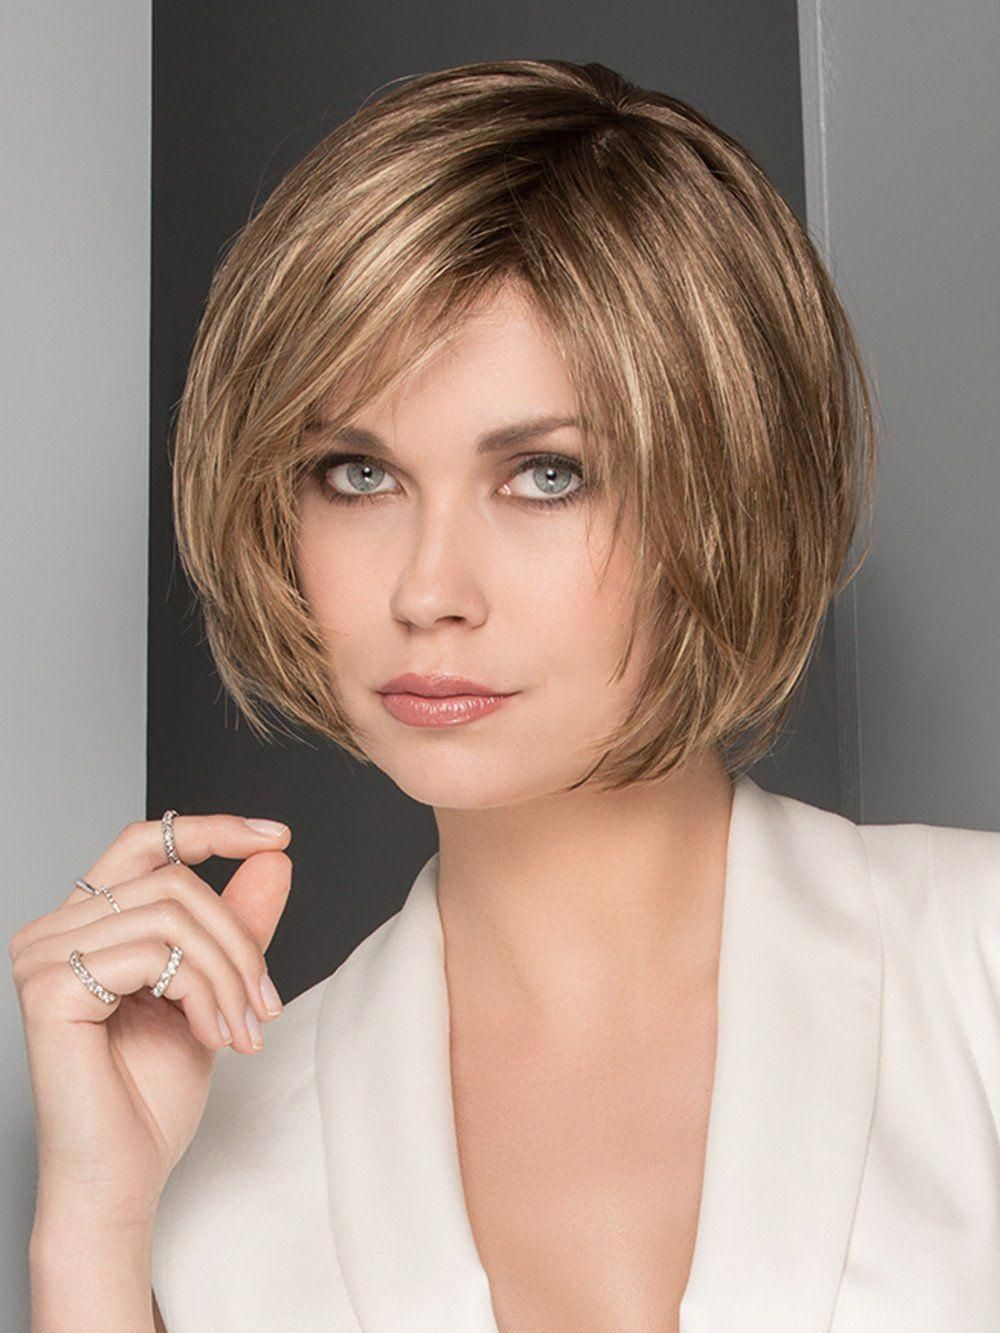 Naturliches Mittel Gegen Haarausfall Antihair Loss Remedy Natural Haar Laagjes Antihair In 2020 Frisuren Kurze Haare Blond Kurze Haare Frisur Ideen Haare